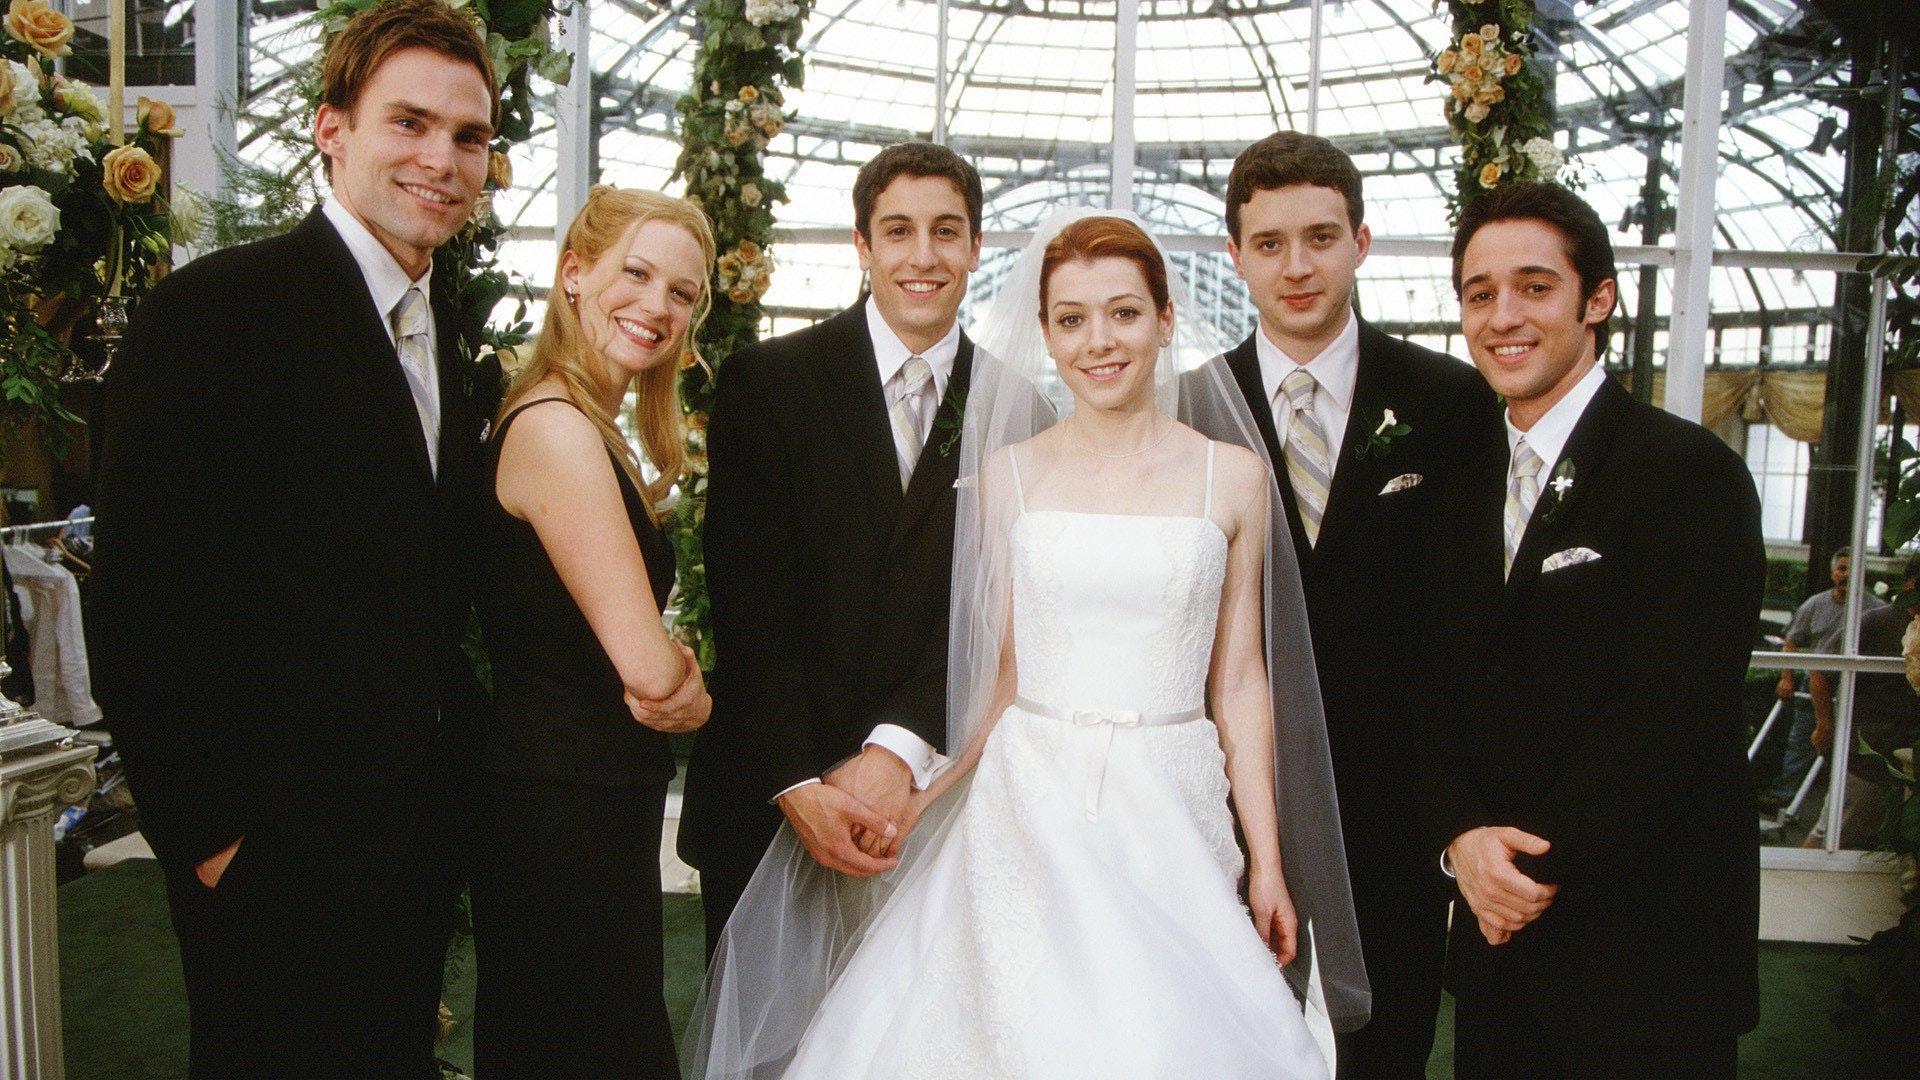 American Wedding Soundtrack